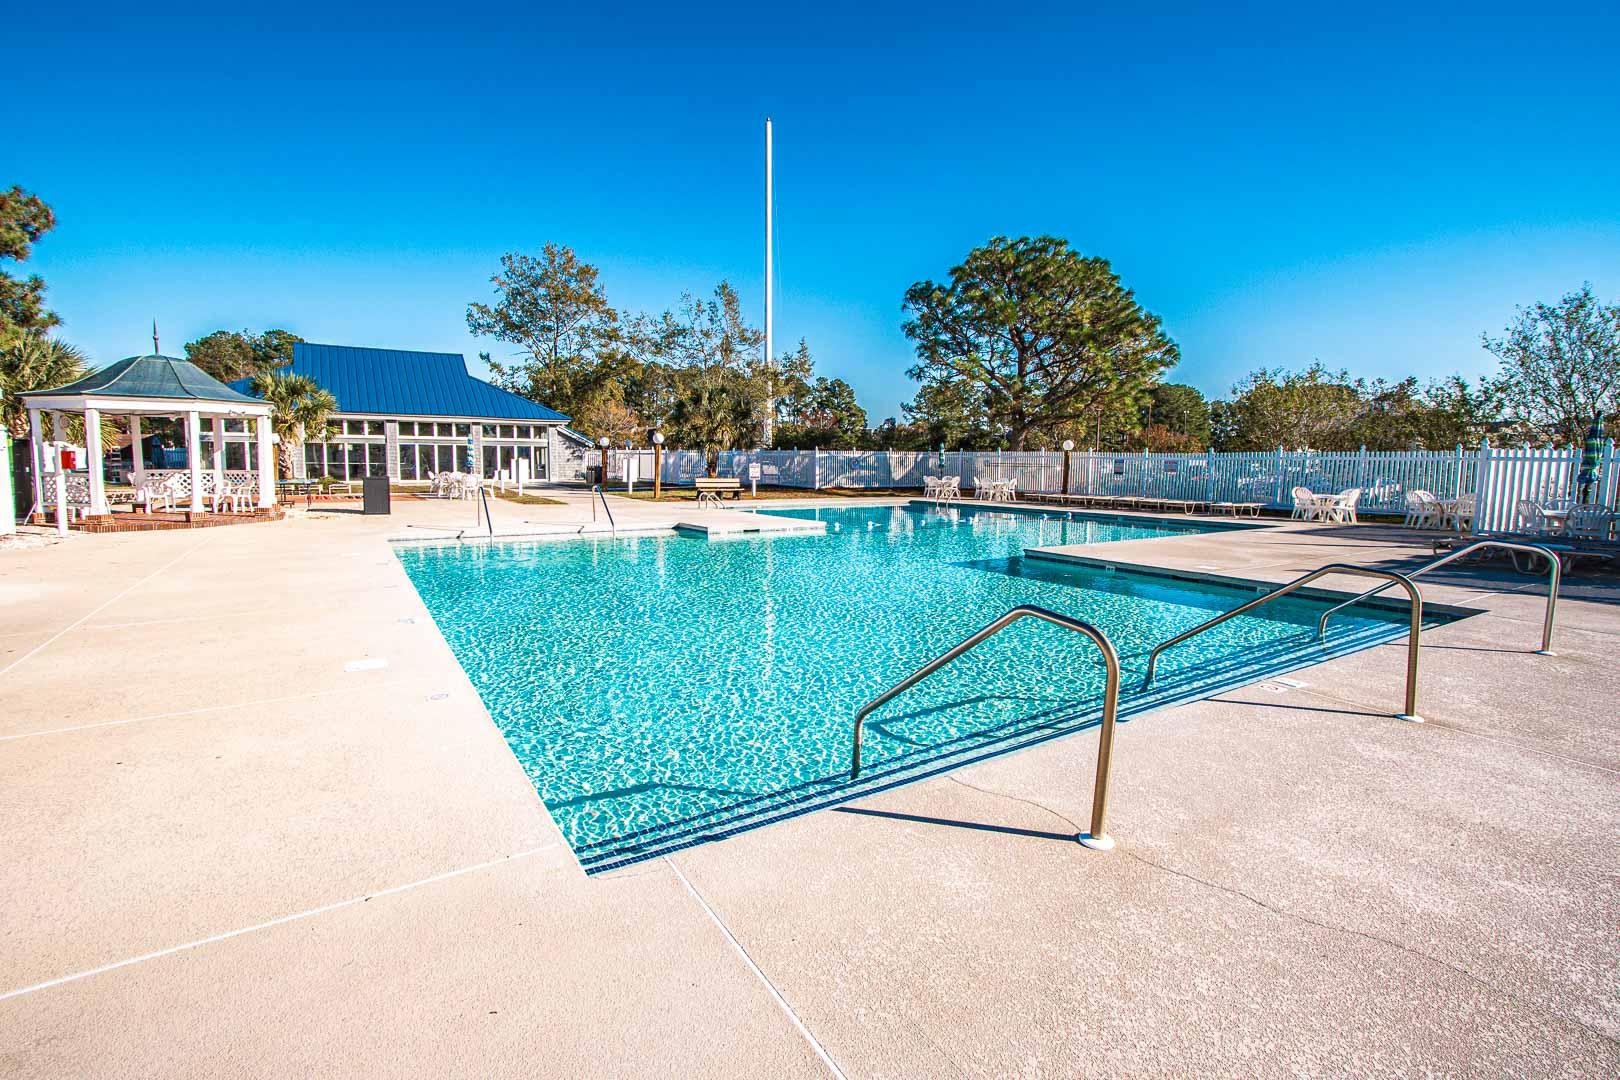 A spacious outdoor swimming pool at VRI's Harbourside II in New Bern, North Carolina.